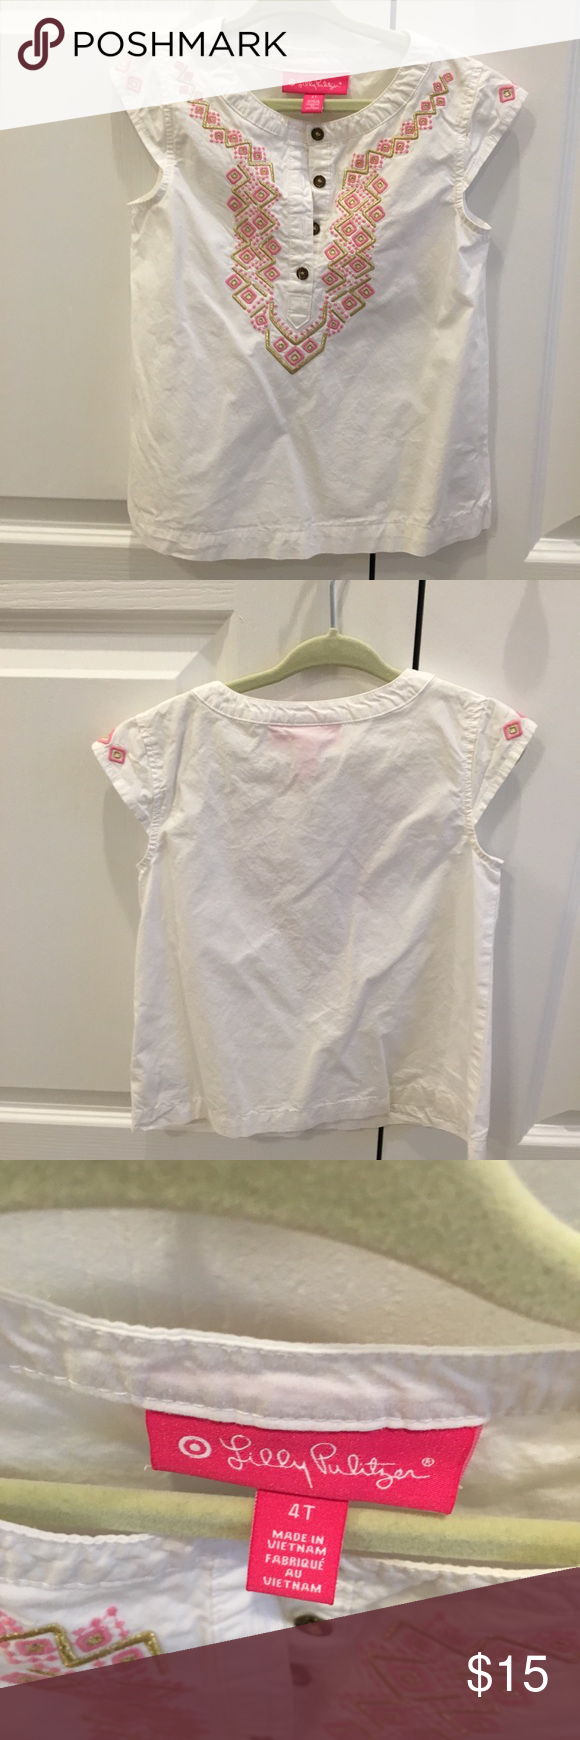 5d86d8f32dbf Cute Girl Shirts At Target - DREAMWORKS